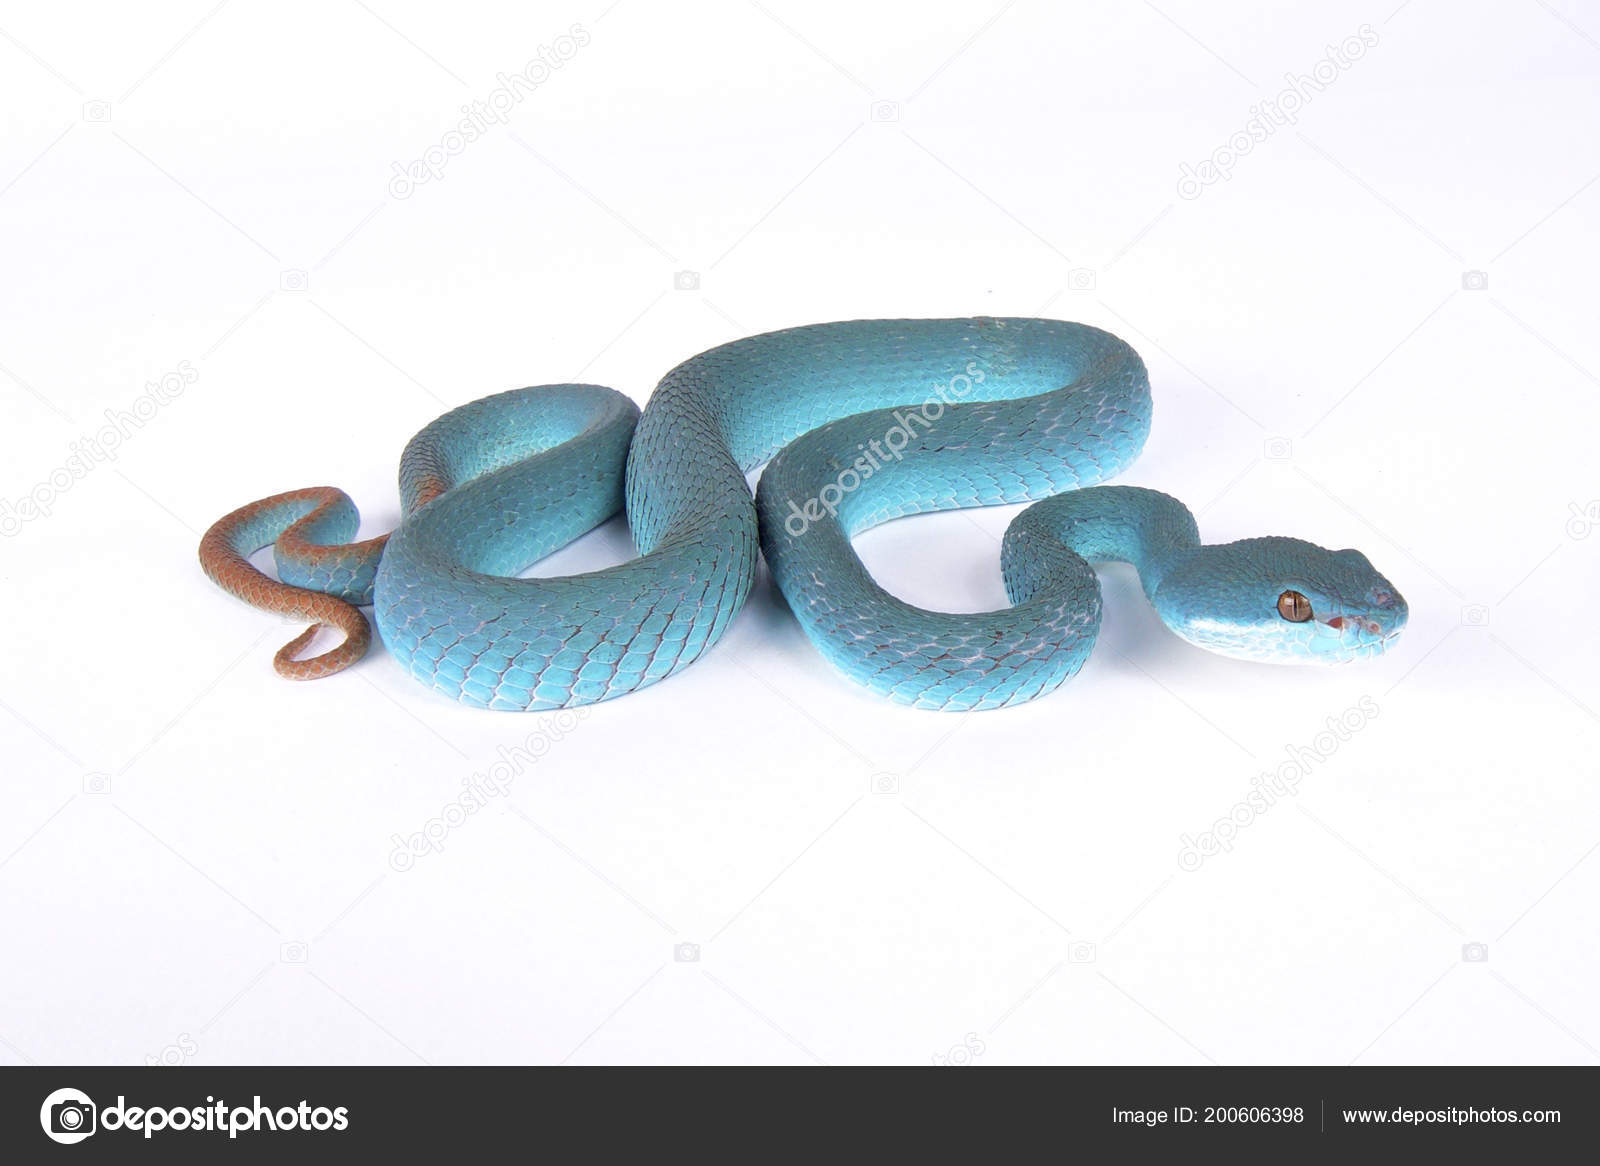 Blue island pit viper | Blue Island Pit Viper Trimeresurus